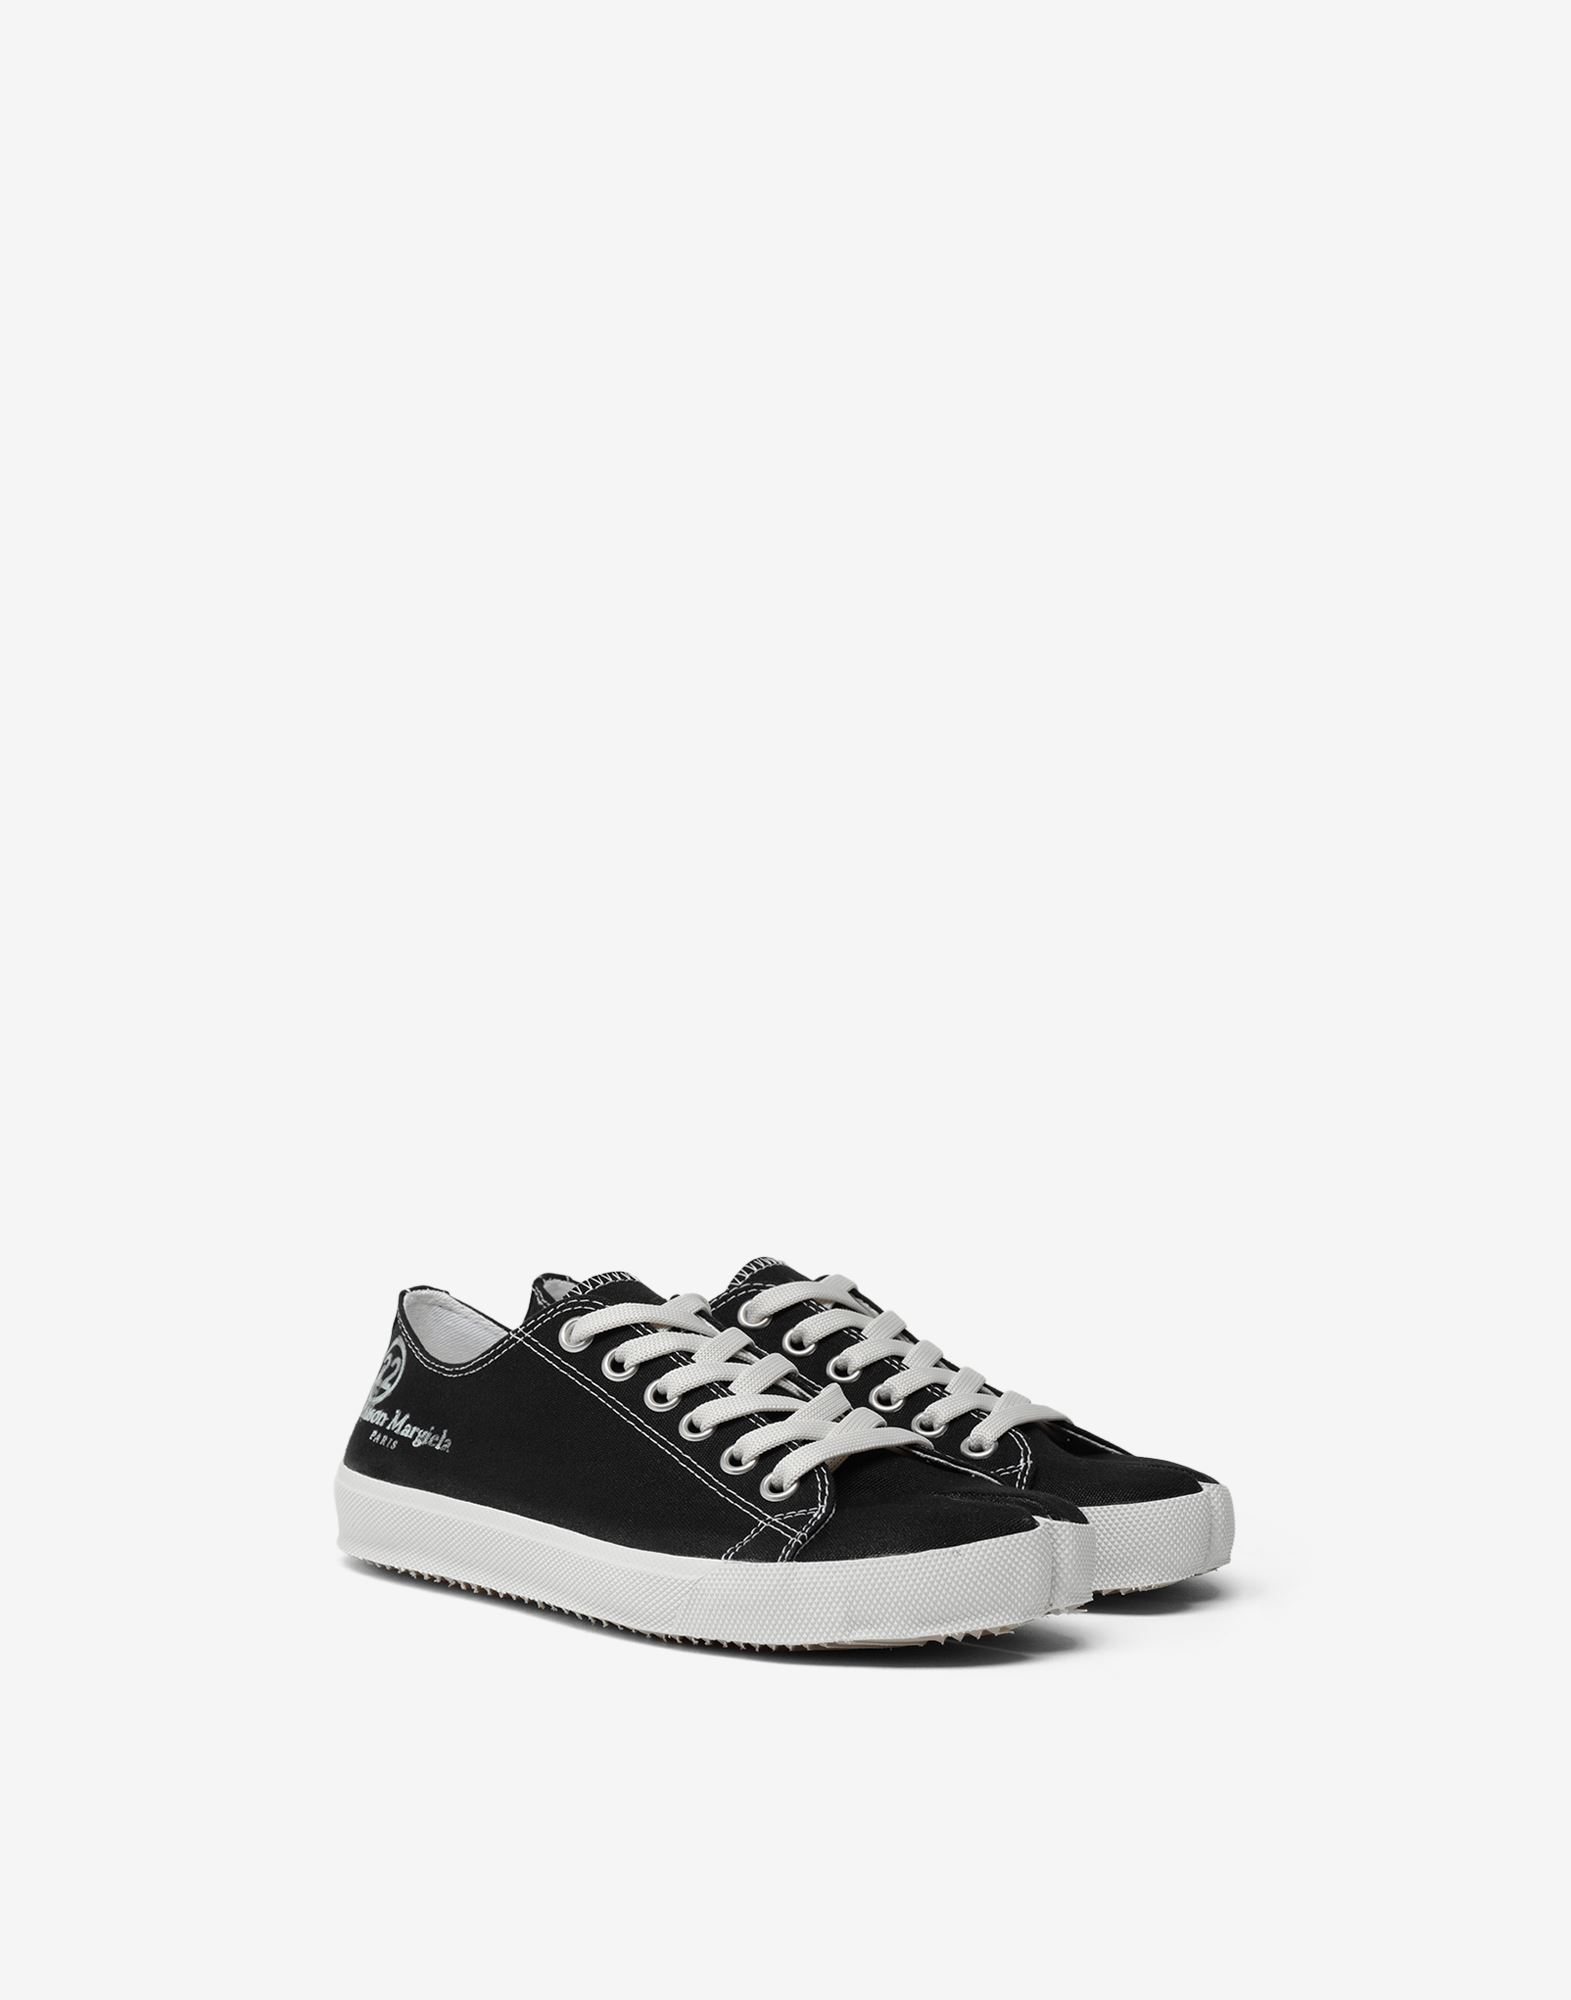 MAISON MARGIELA Tabi low top canvas sneakers Sneakers Tabi Woman r